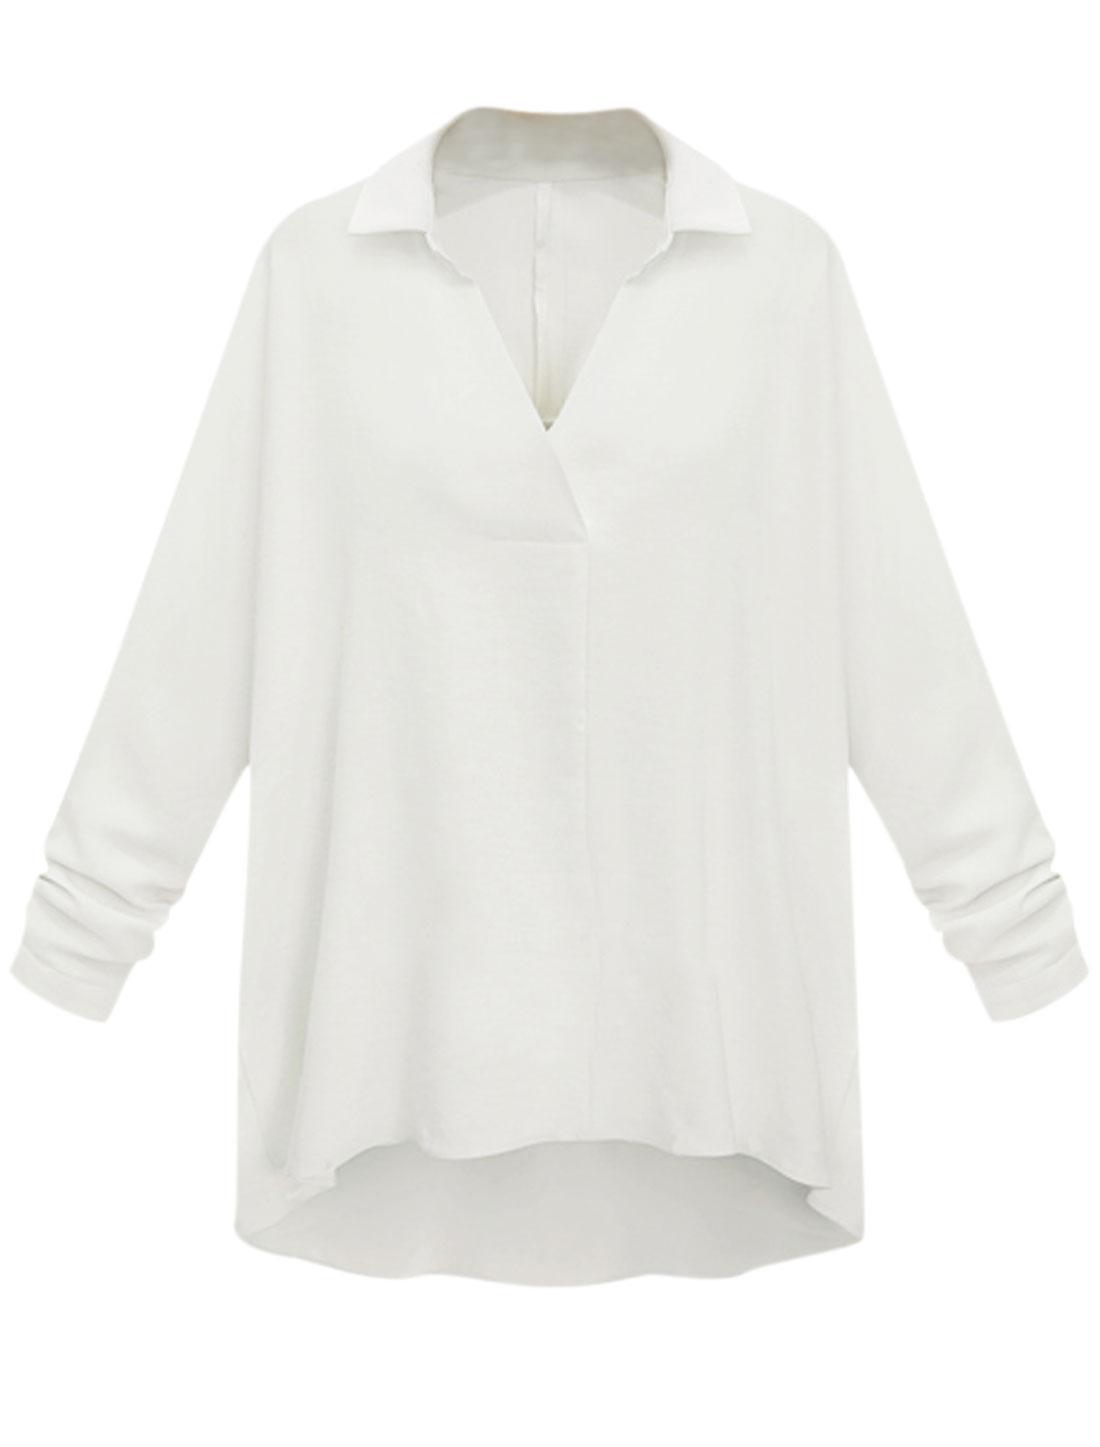 Woman Long Raglan Sleeves High Low Hem Slipover Casual Shirt White L